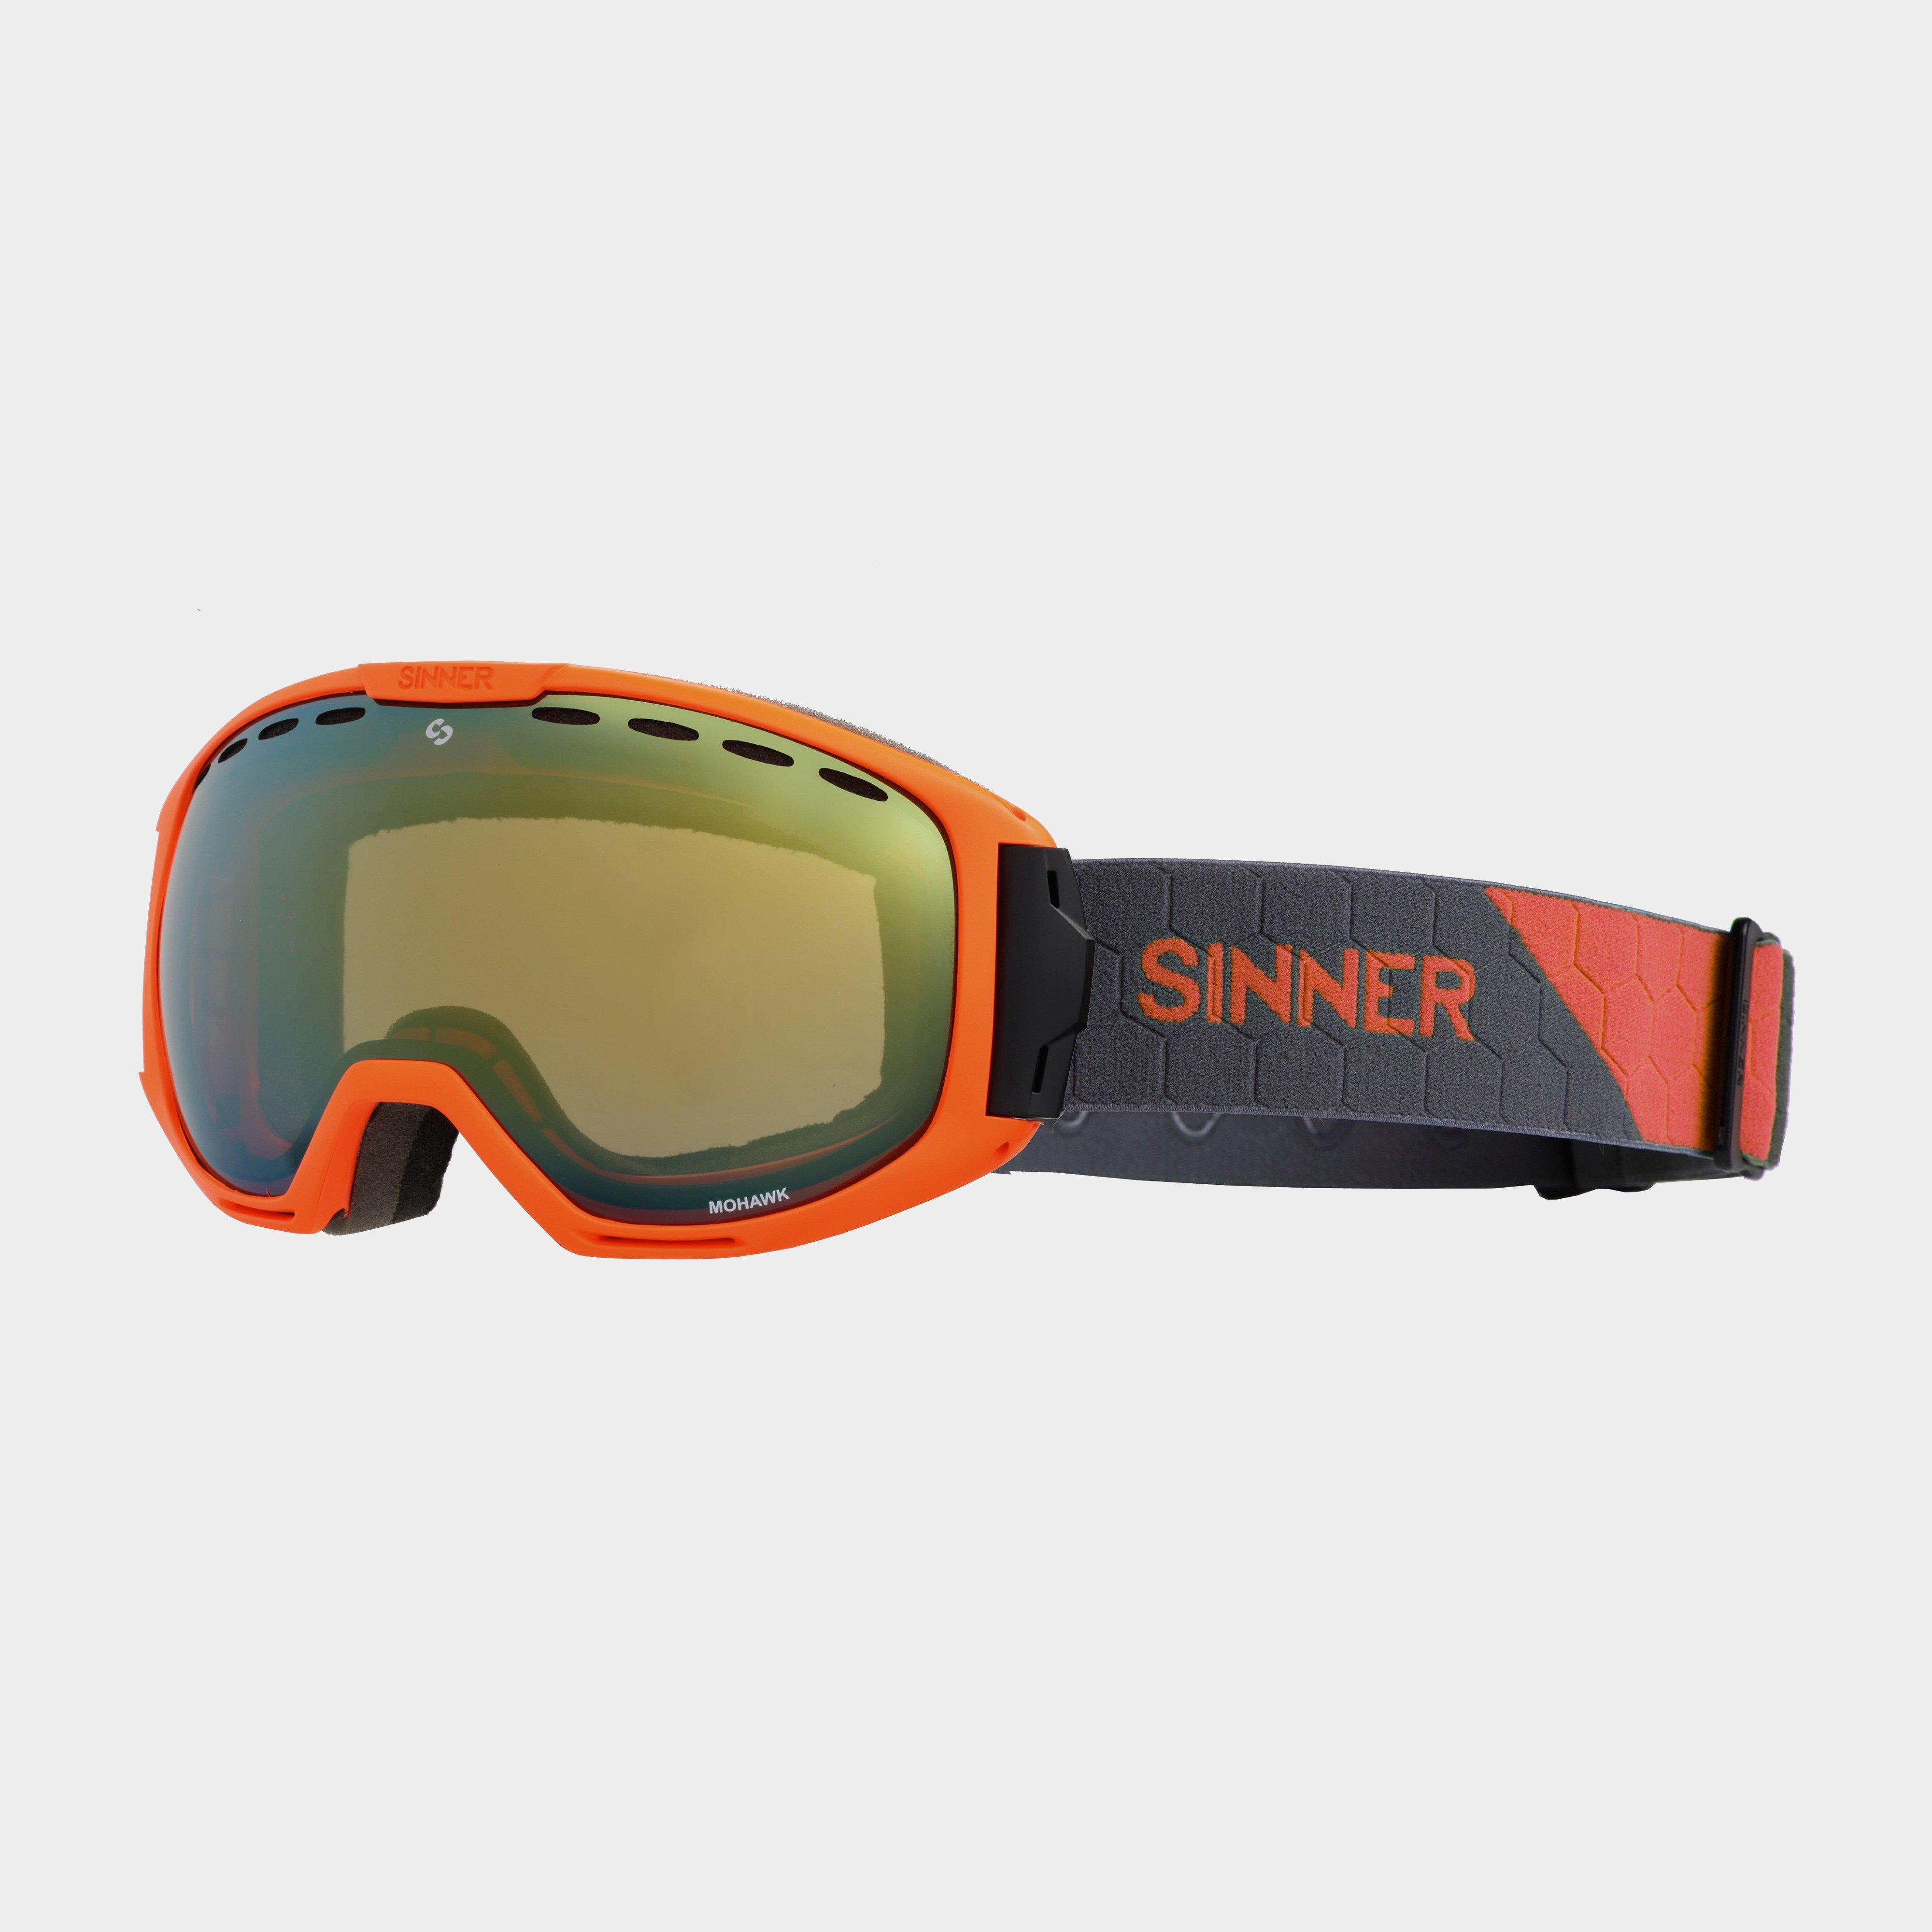 Sinner MOHAWK ORANGE MIRROR Goggles, ORANGE/BLACK